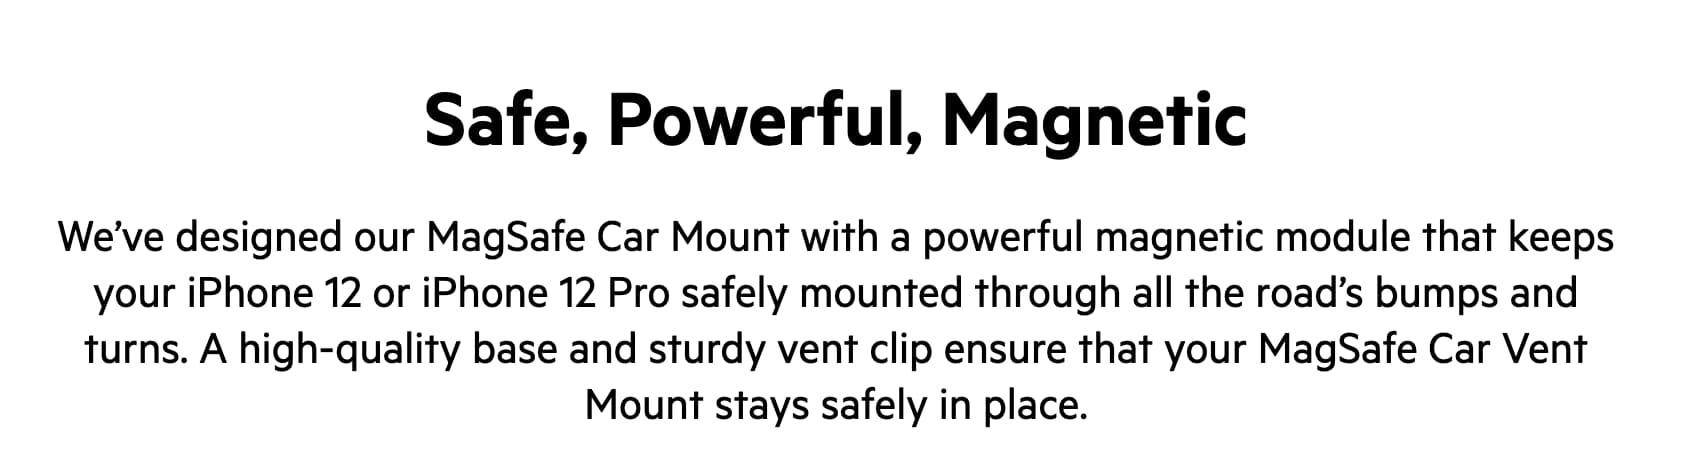 MagSafe 相關配件都需要通過 MFM 認證